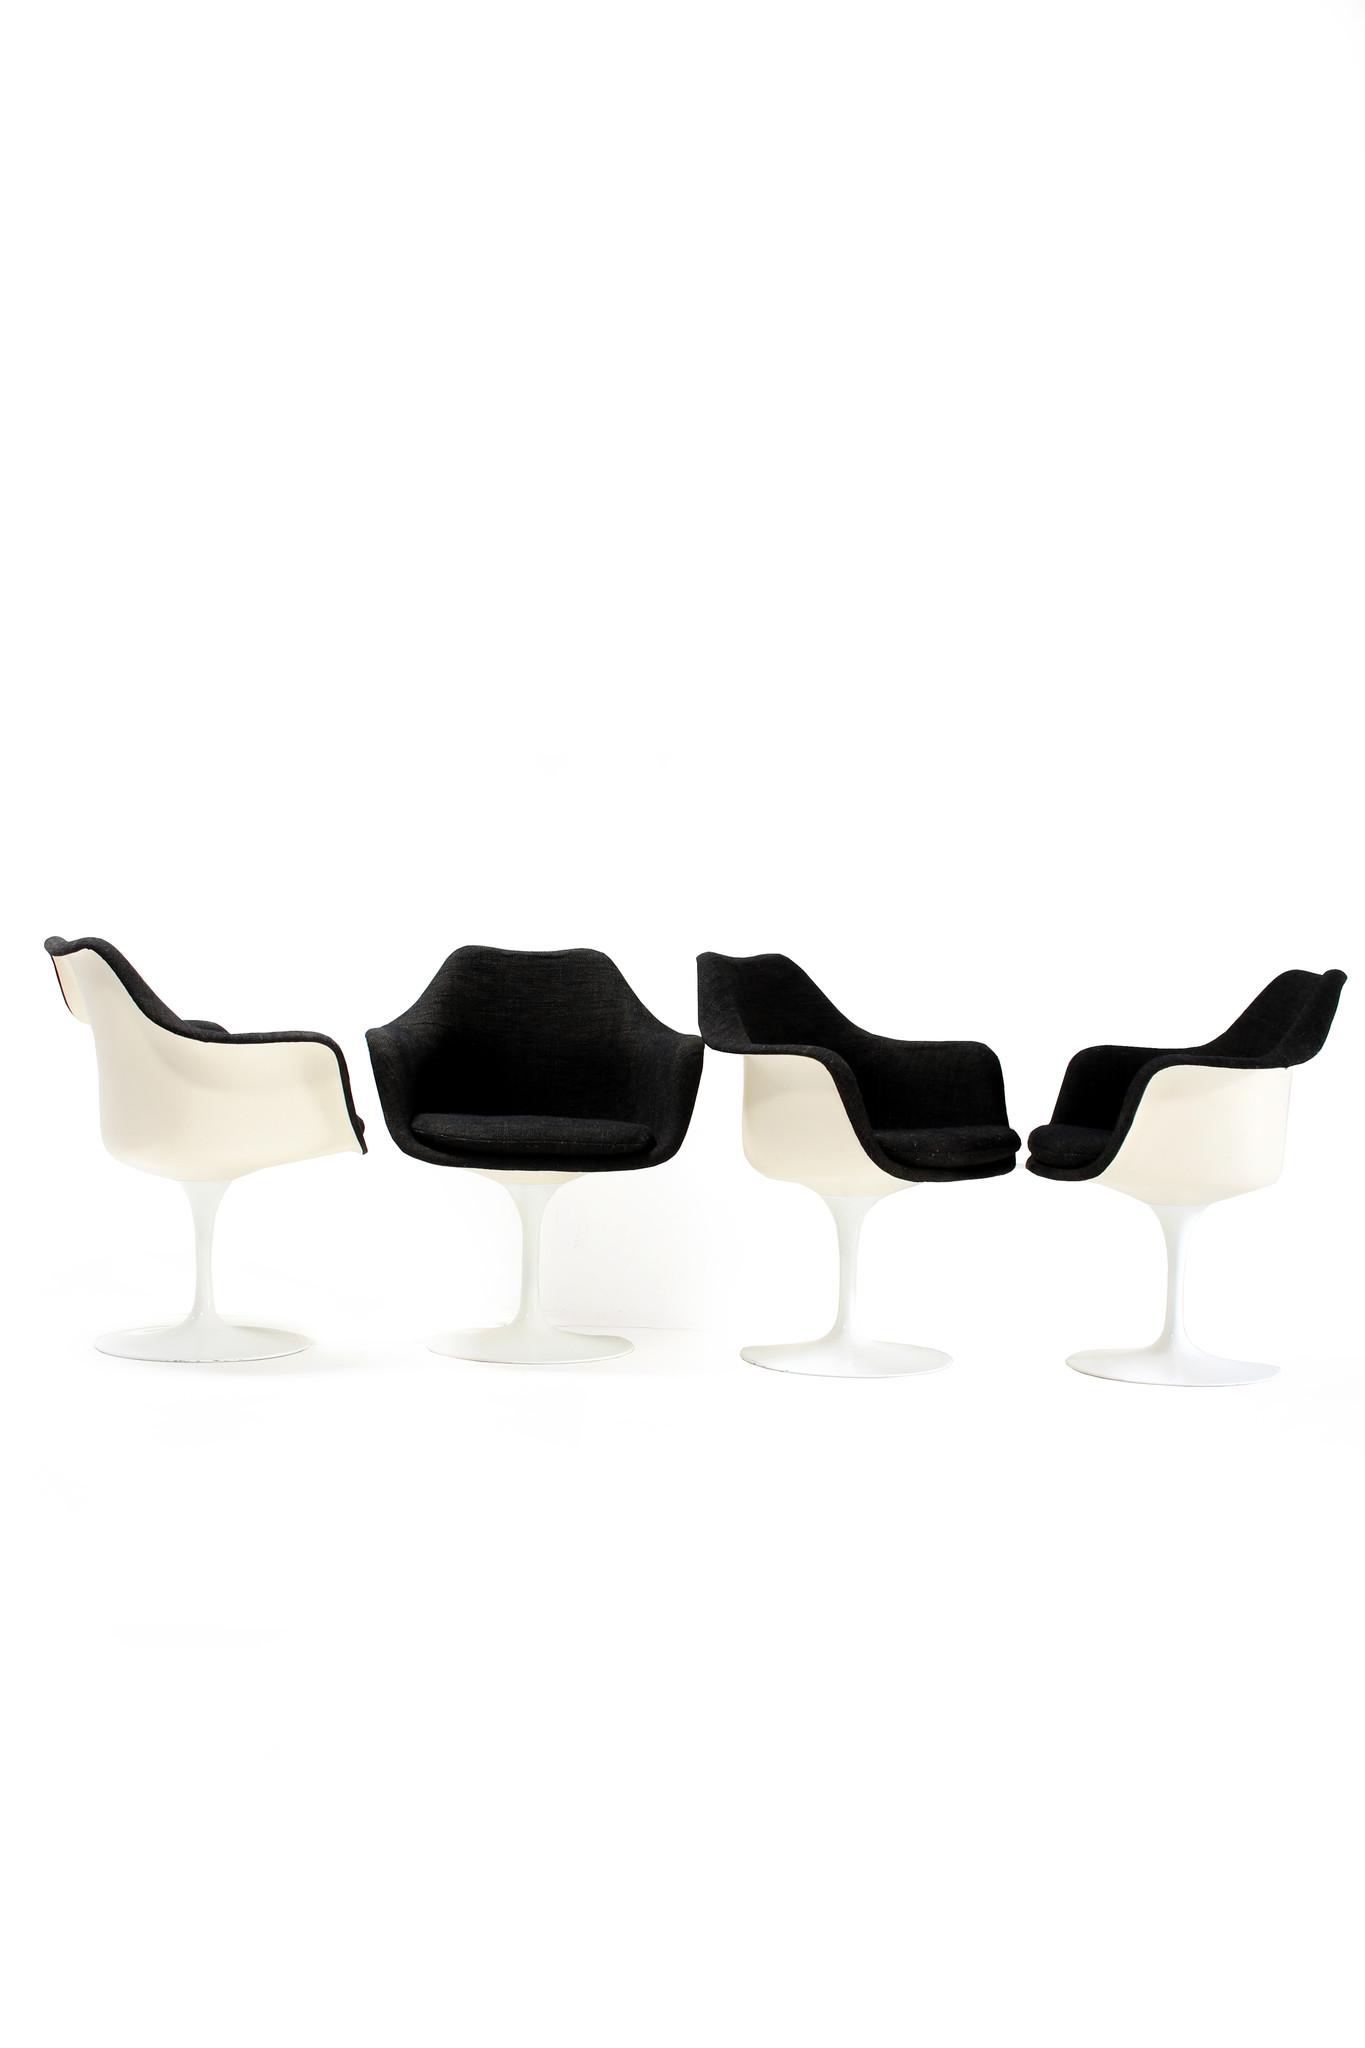 Set of 4 Tulip chairs by Eero Saarinen for Knoll International